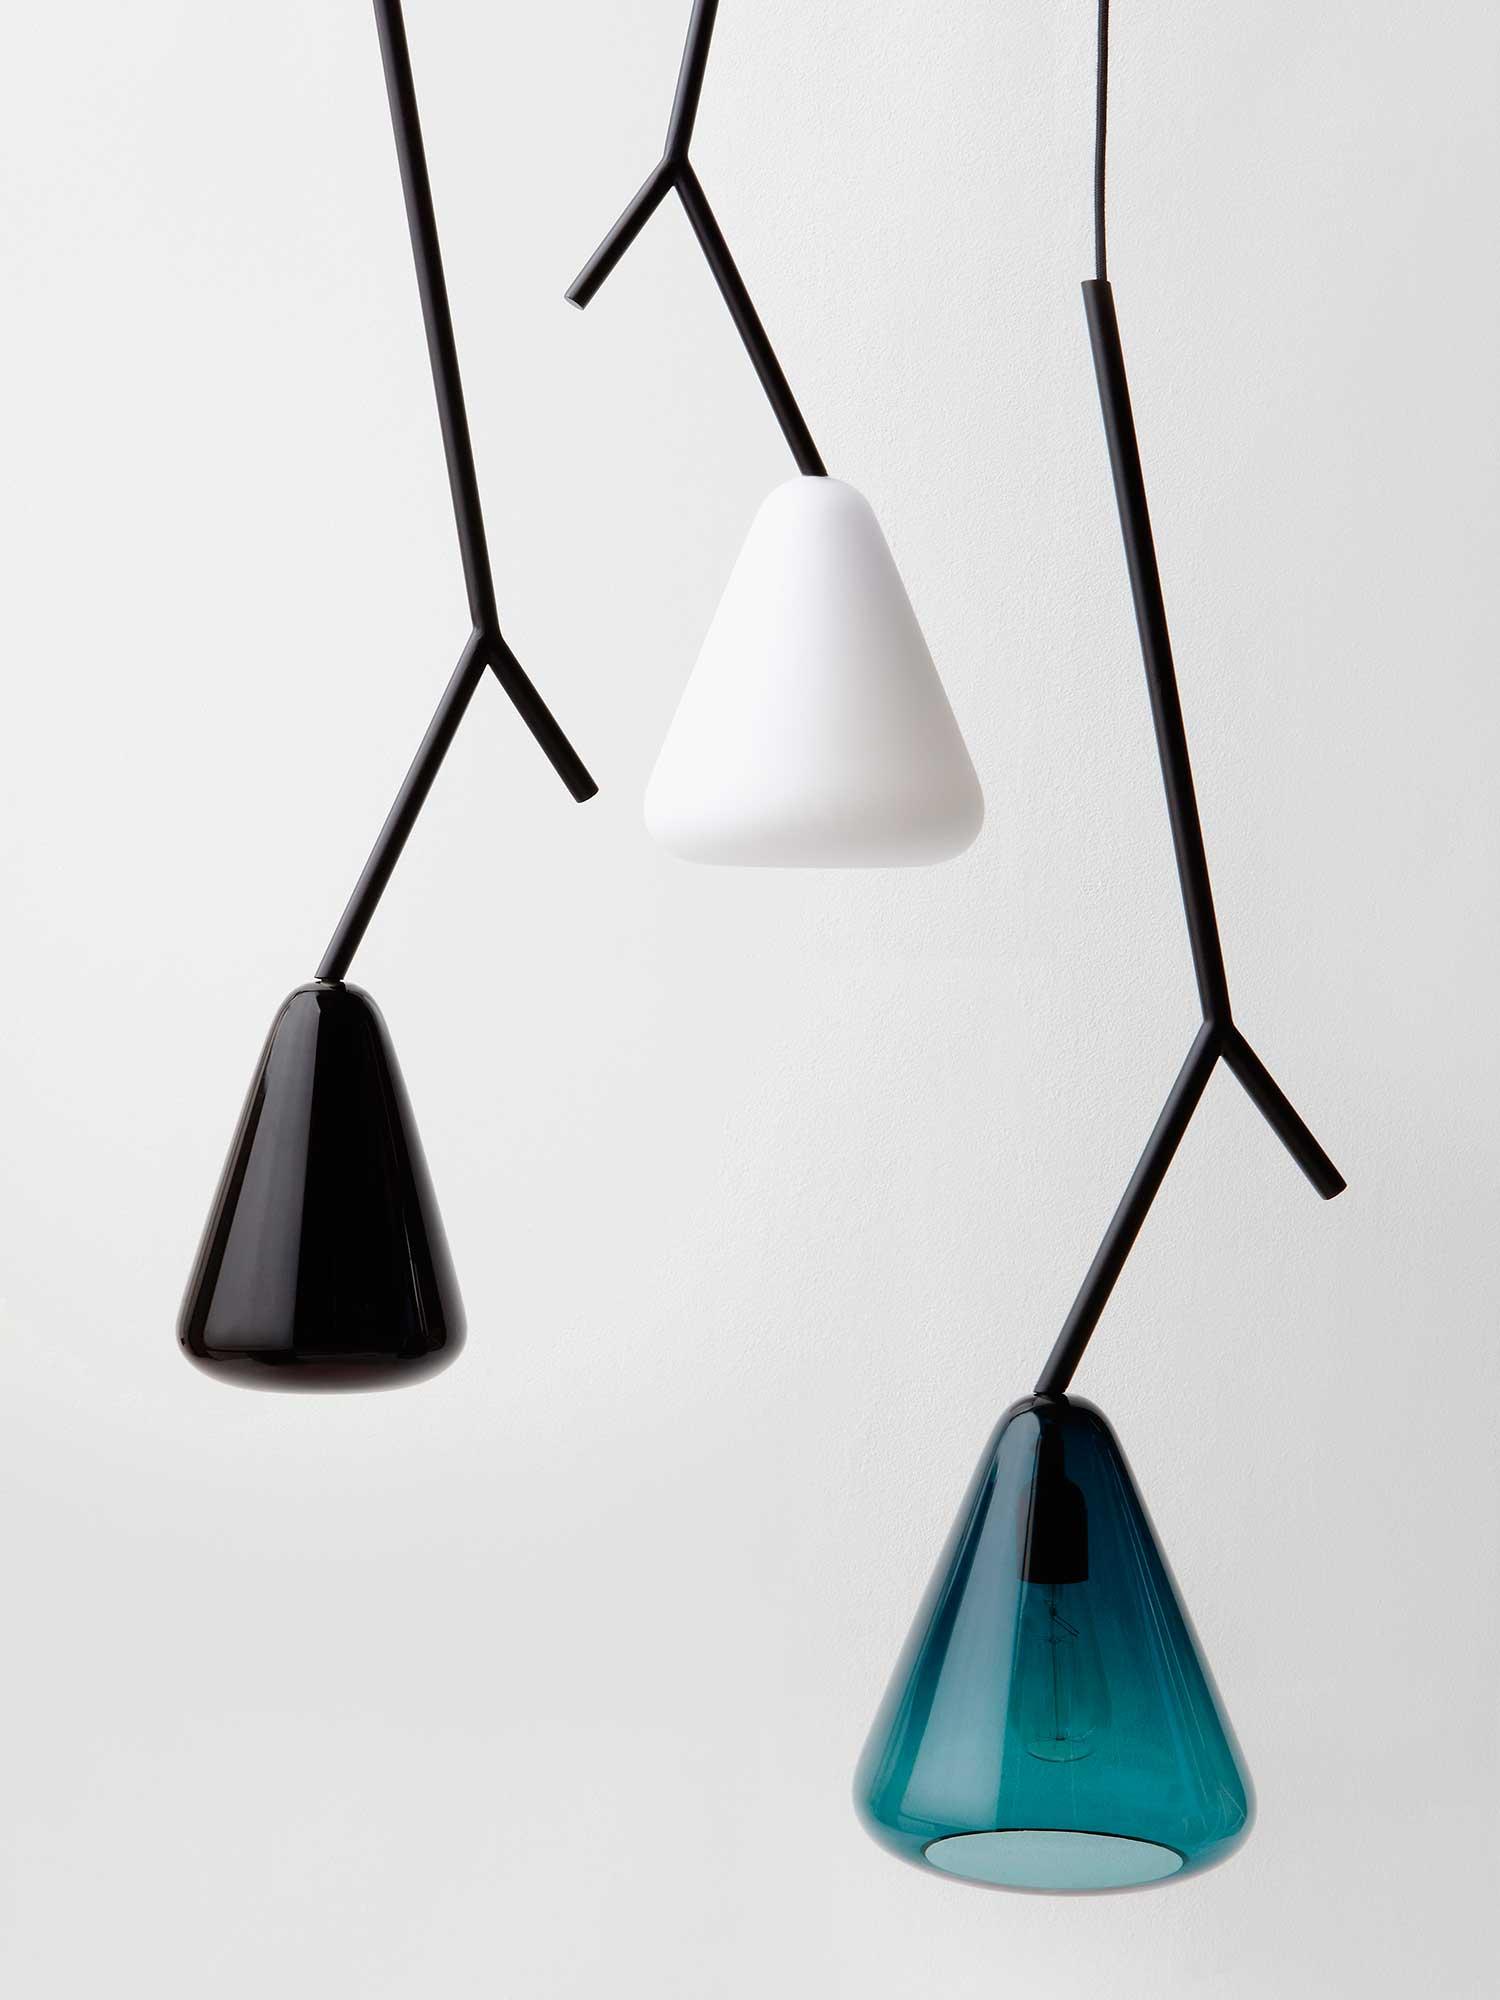 SaloneSatellite 2015 MAIJA PUOSKARI vanamo lamp   #MILANTRACE2015 by Yellowtrace